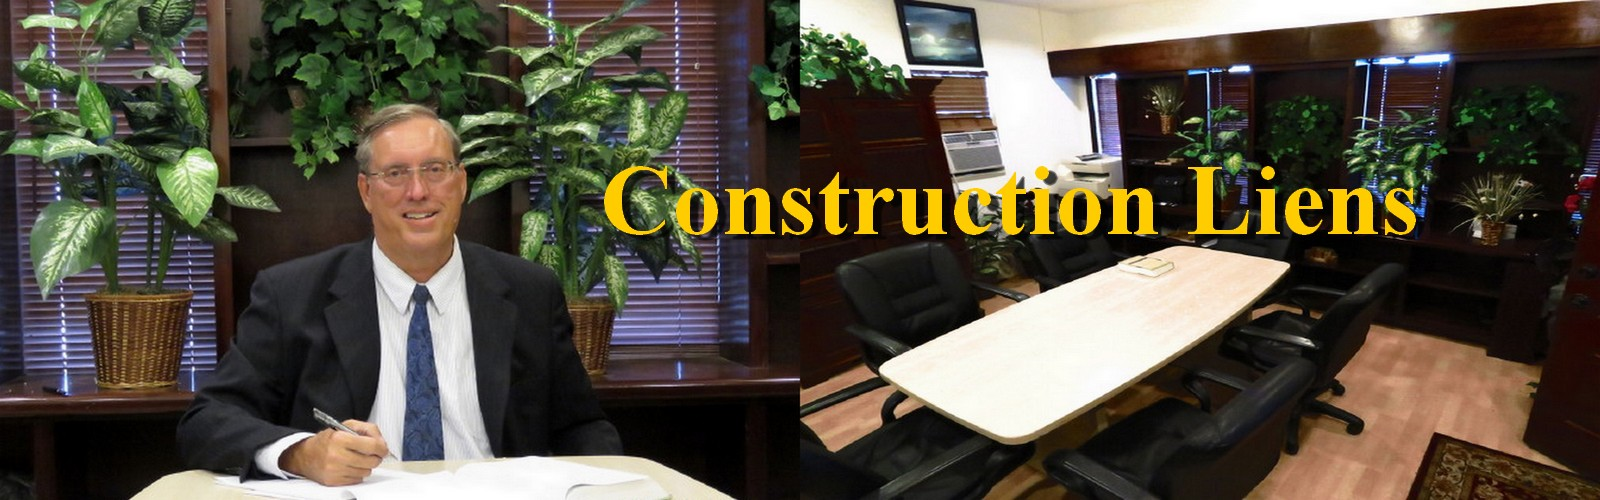 Construction Attorney Herbert Allen's construction law guide to construction liens.